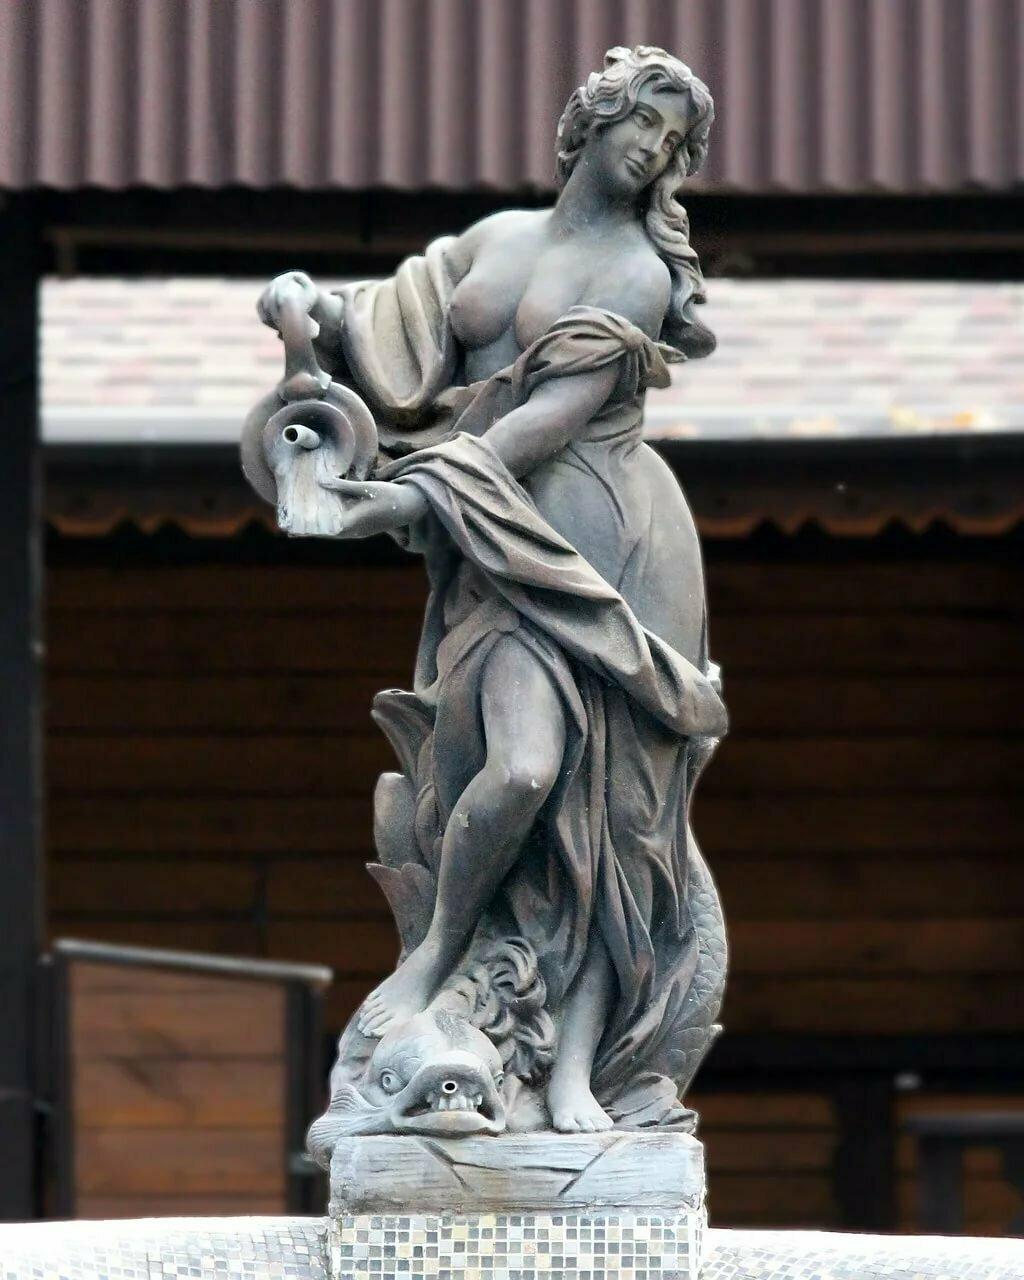 любая реклама, картинки изображения скульптуры силуэты, длина юбок